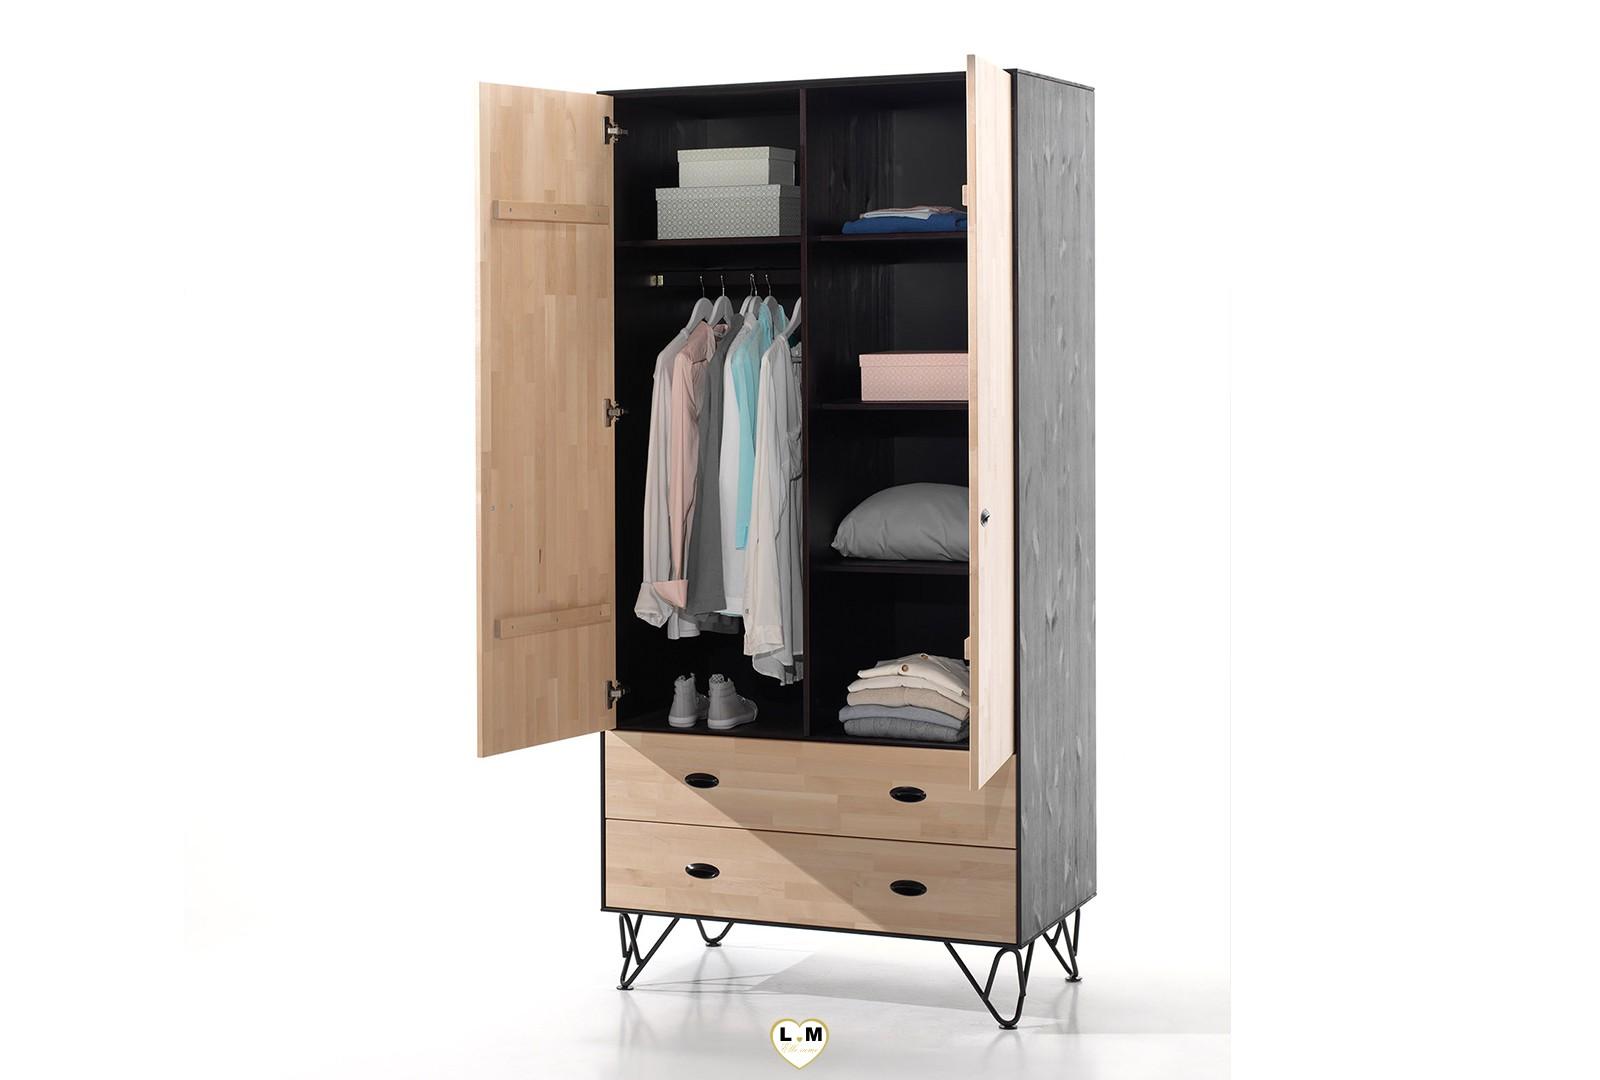 willy chambre ado l 39 armoire 2 portes lignemeuble com. Black Bedroom Furniture Sets. Home Design Ideas